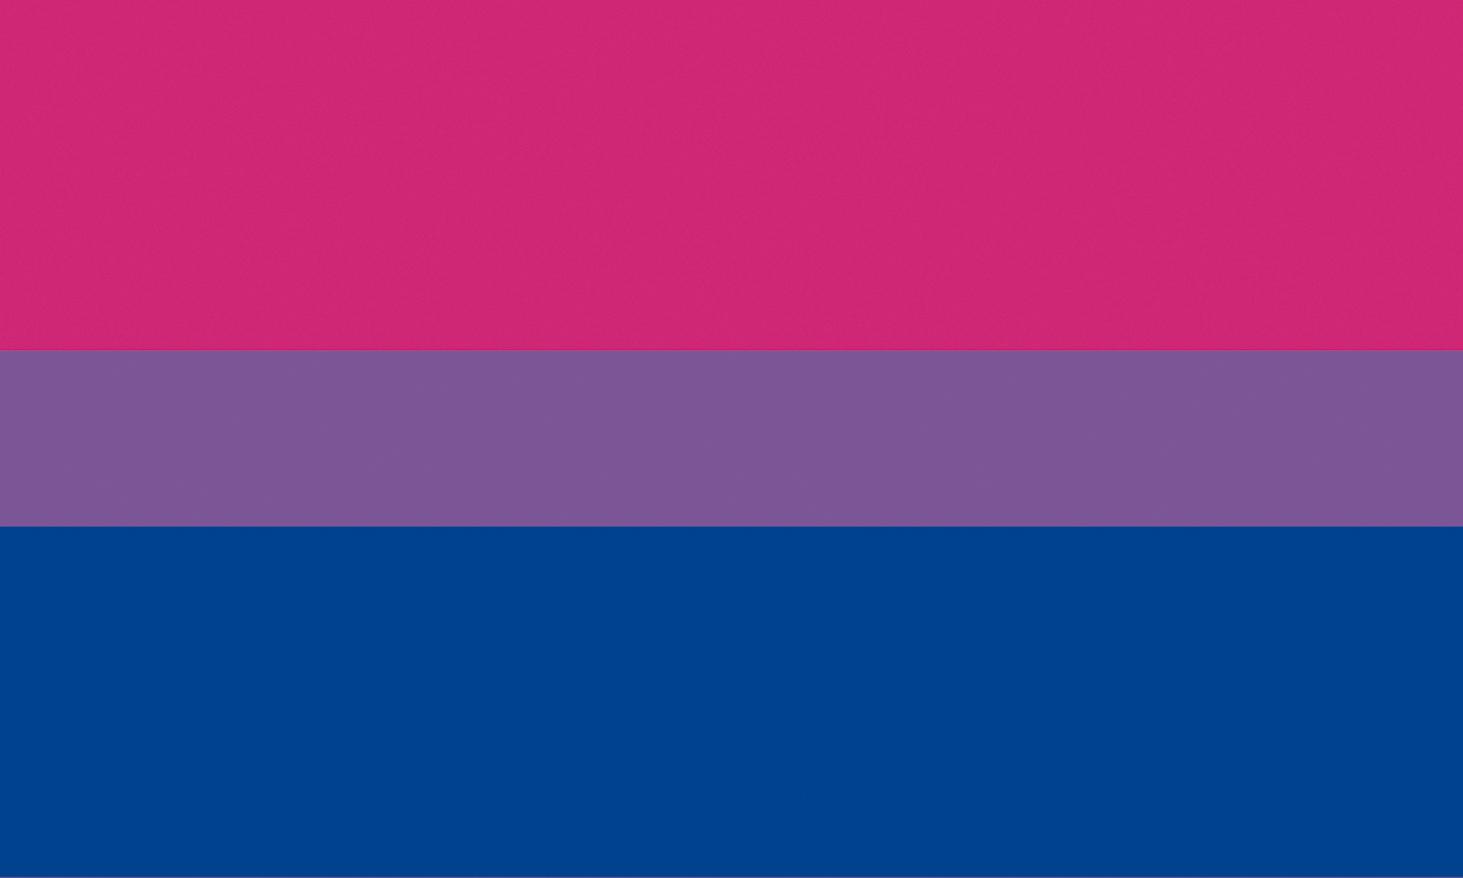 bandera orgullo bisexual